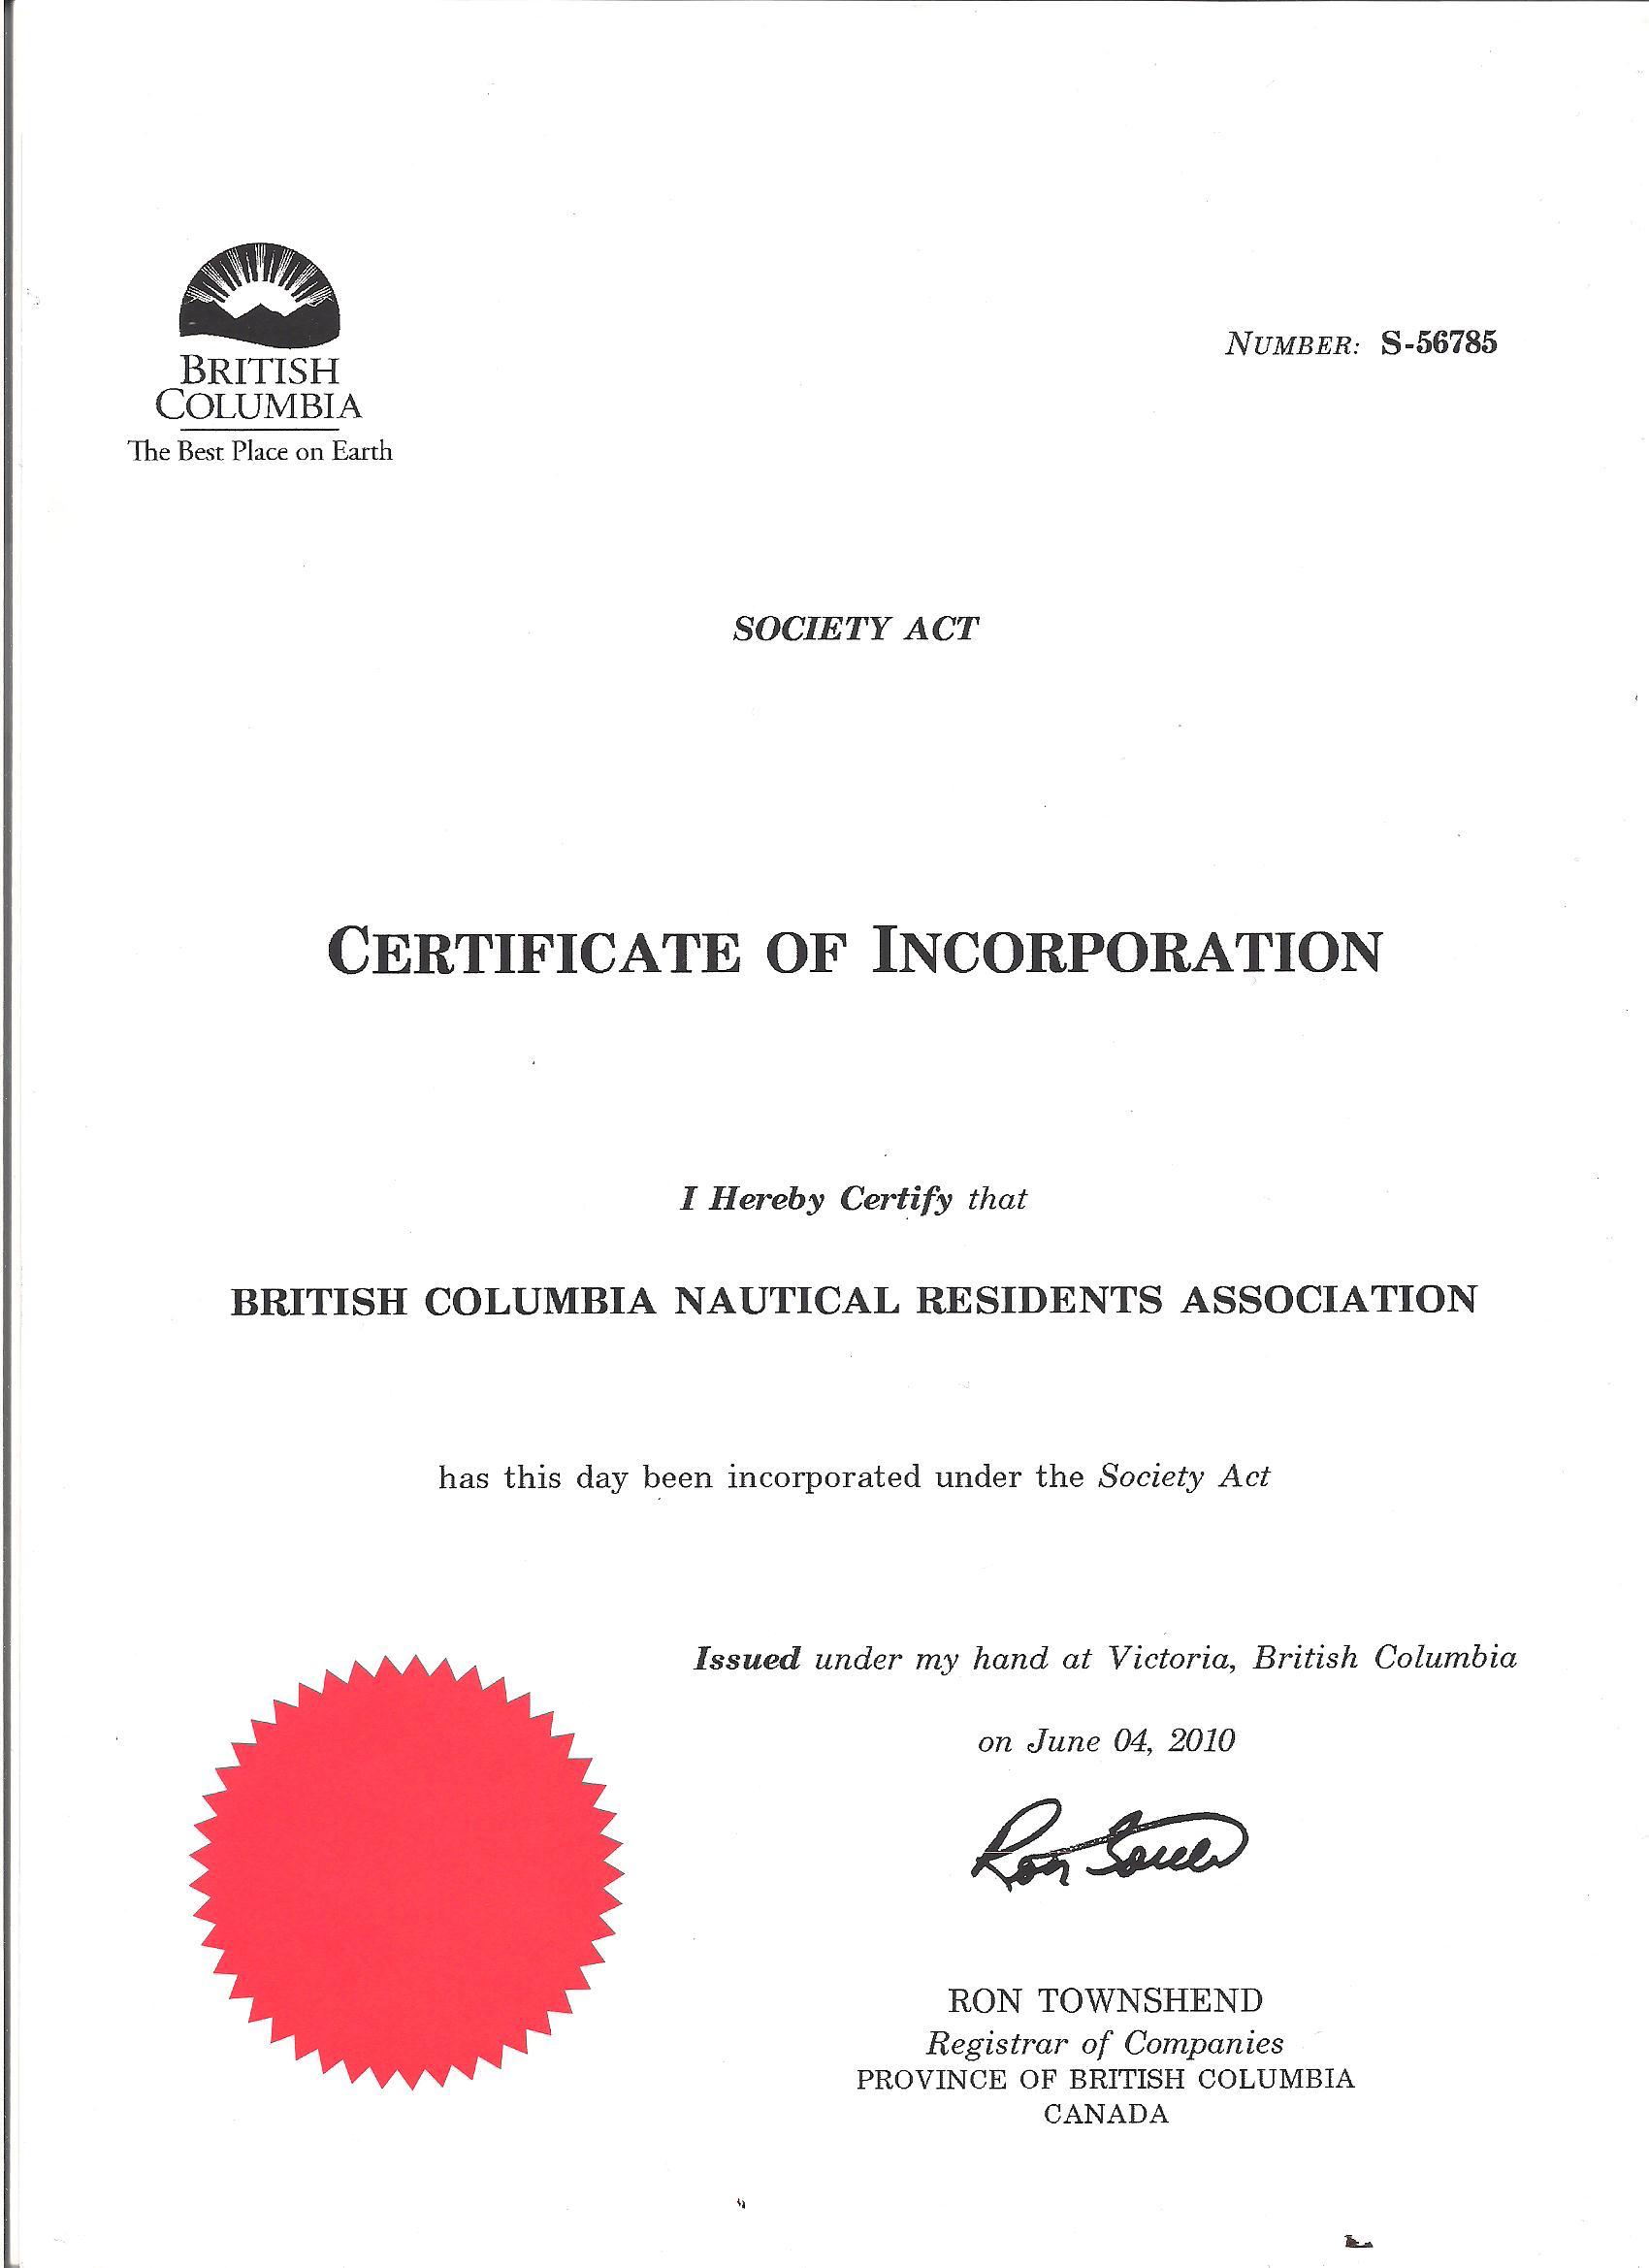 BCNR Incorporation Certificate